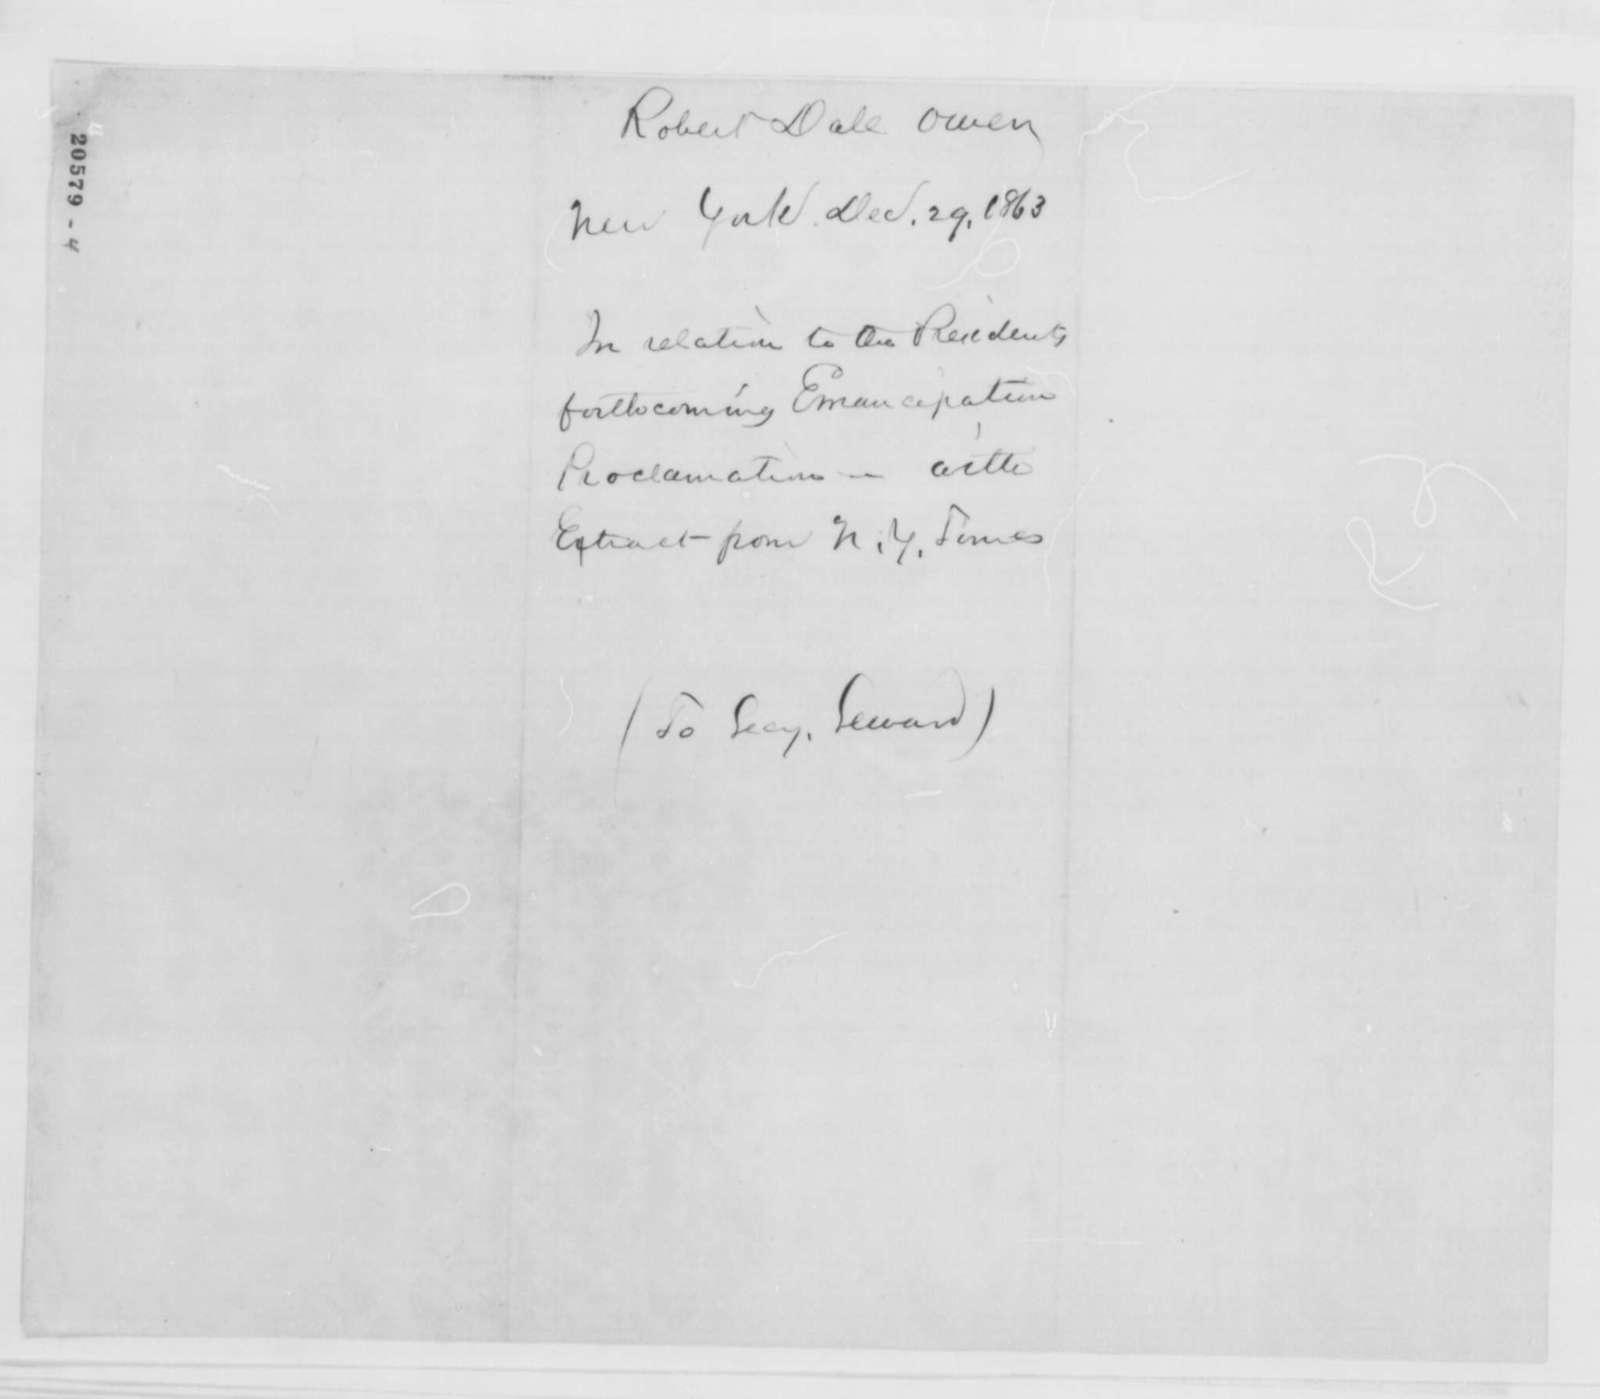 Robert Dale Owen to William H. Seward, Monday, December 29, 1862  (Emancipation Proclamation)